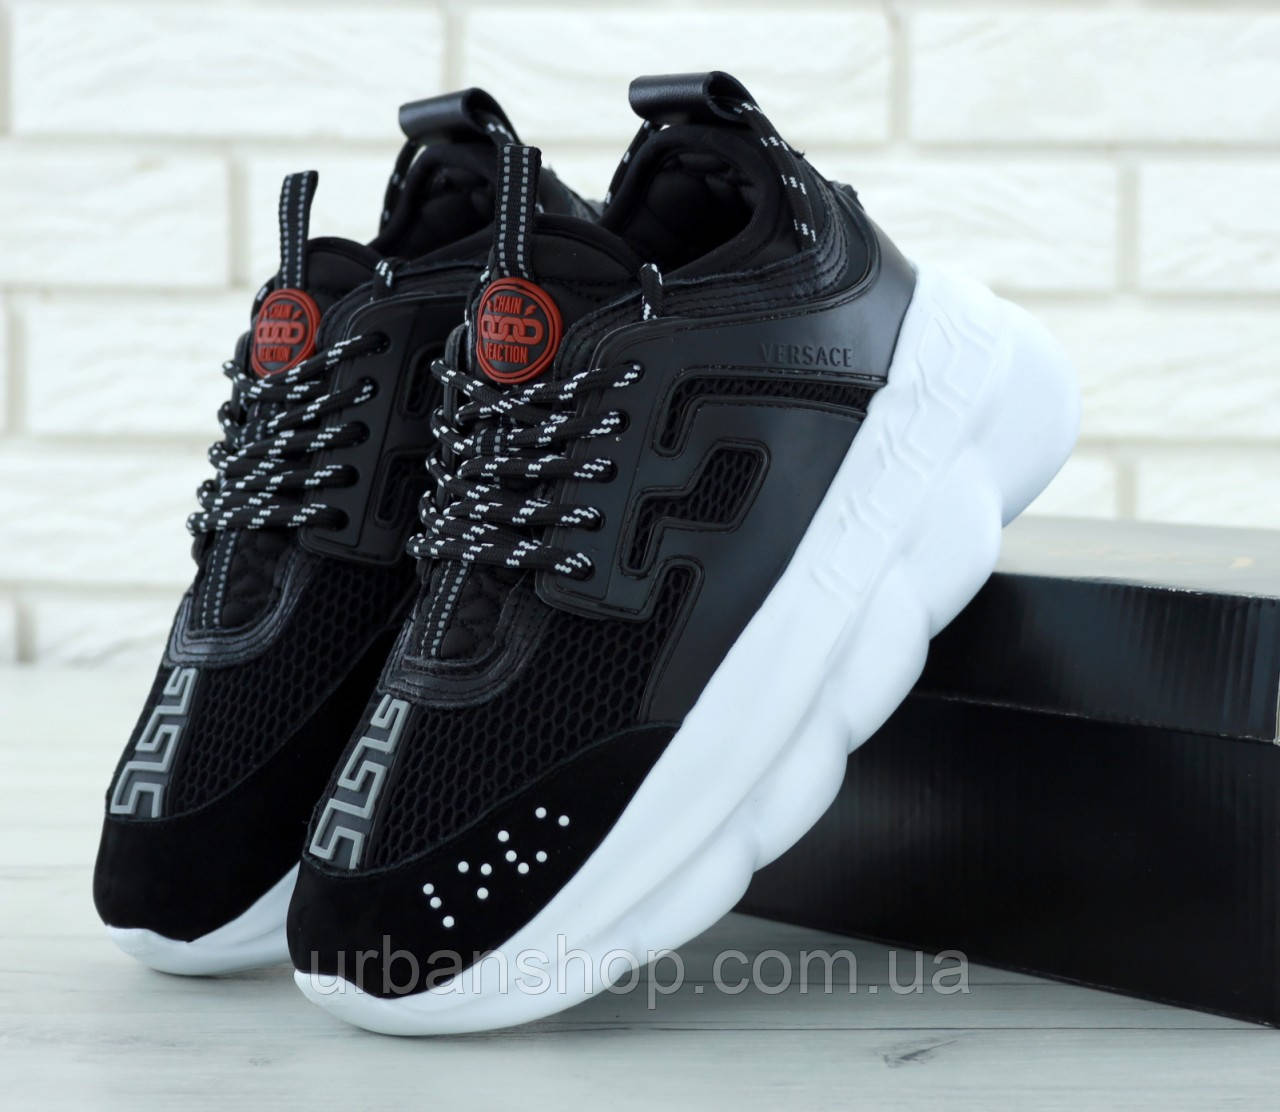 Жіночі кросівки версаче, Versace Chain Reaction Sneakers Black. ТОП Репліка ААА класу.